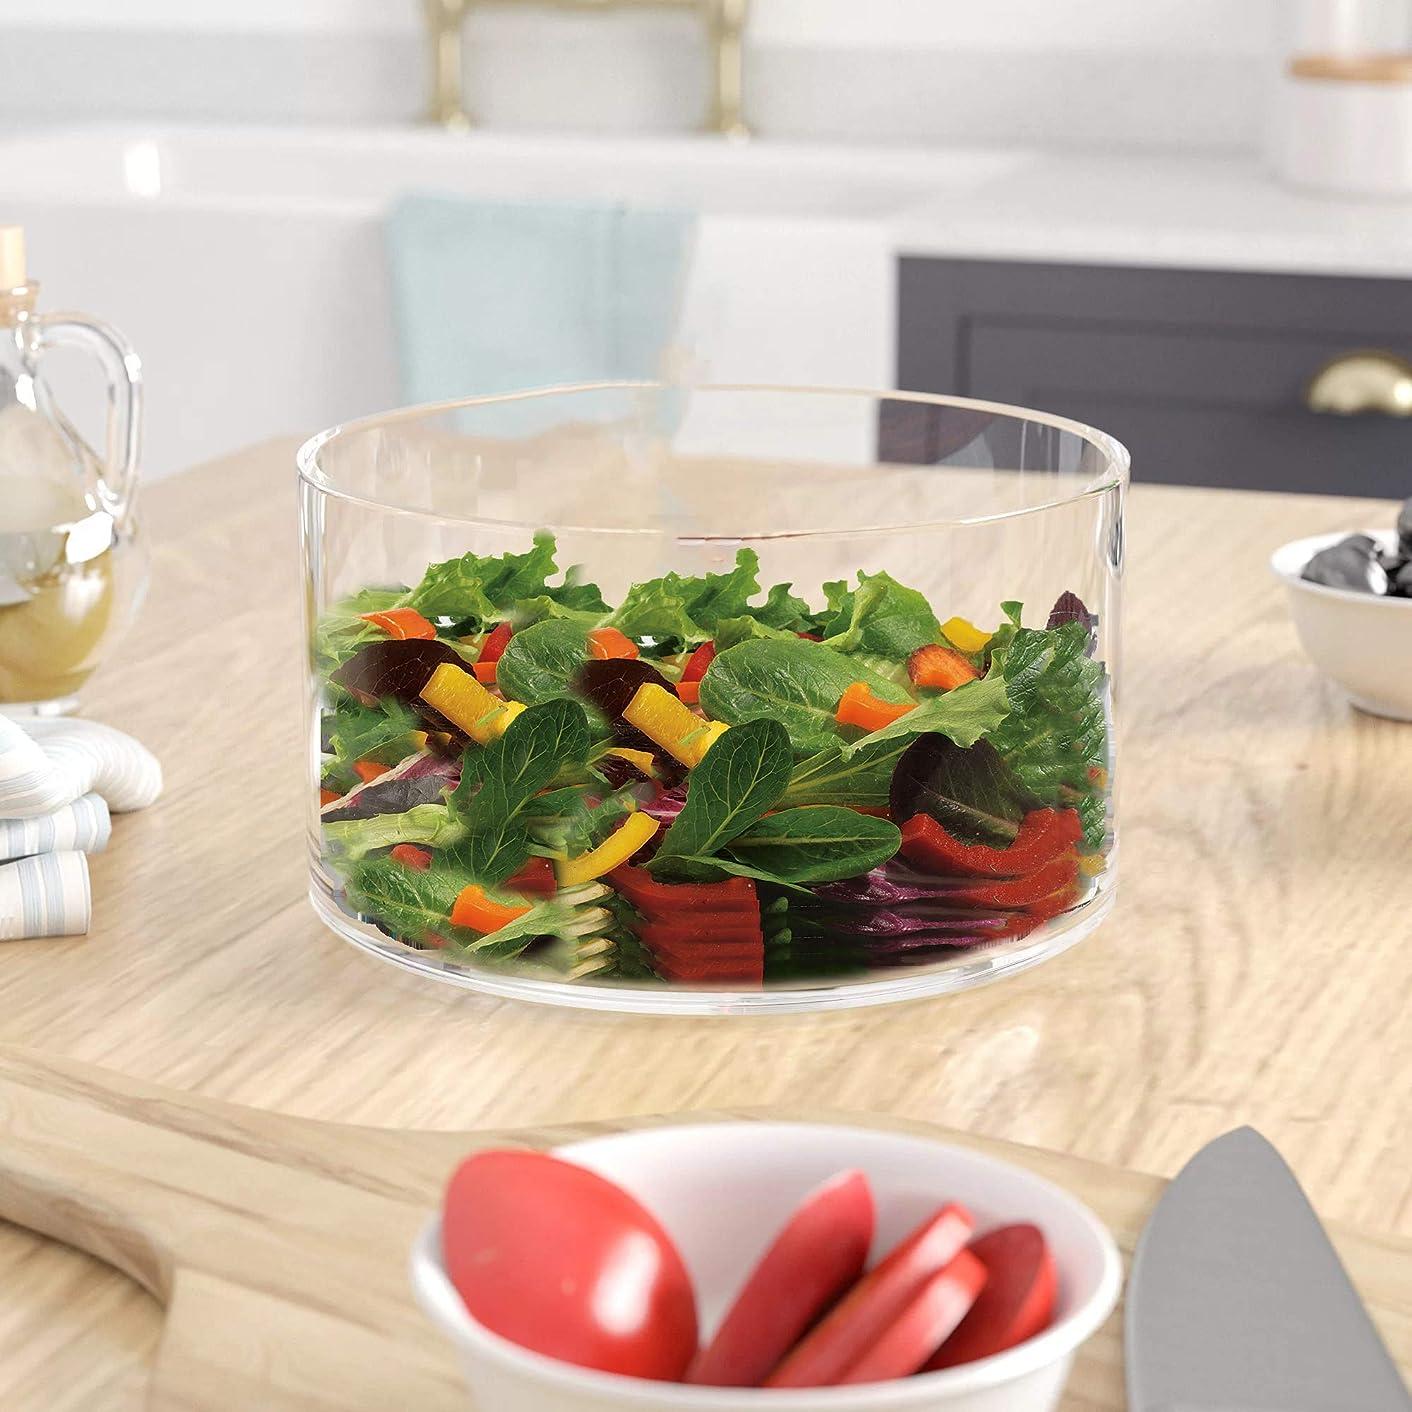 Large Glass Salad Bowl - Serving Dish - 120 Oz. Clear